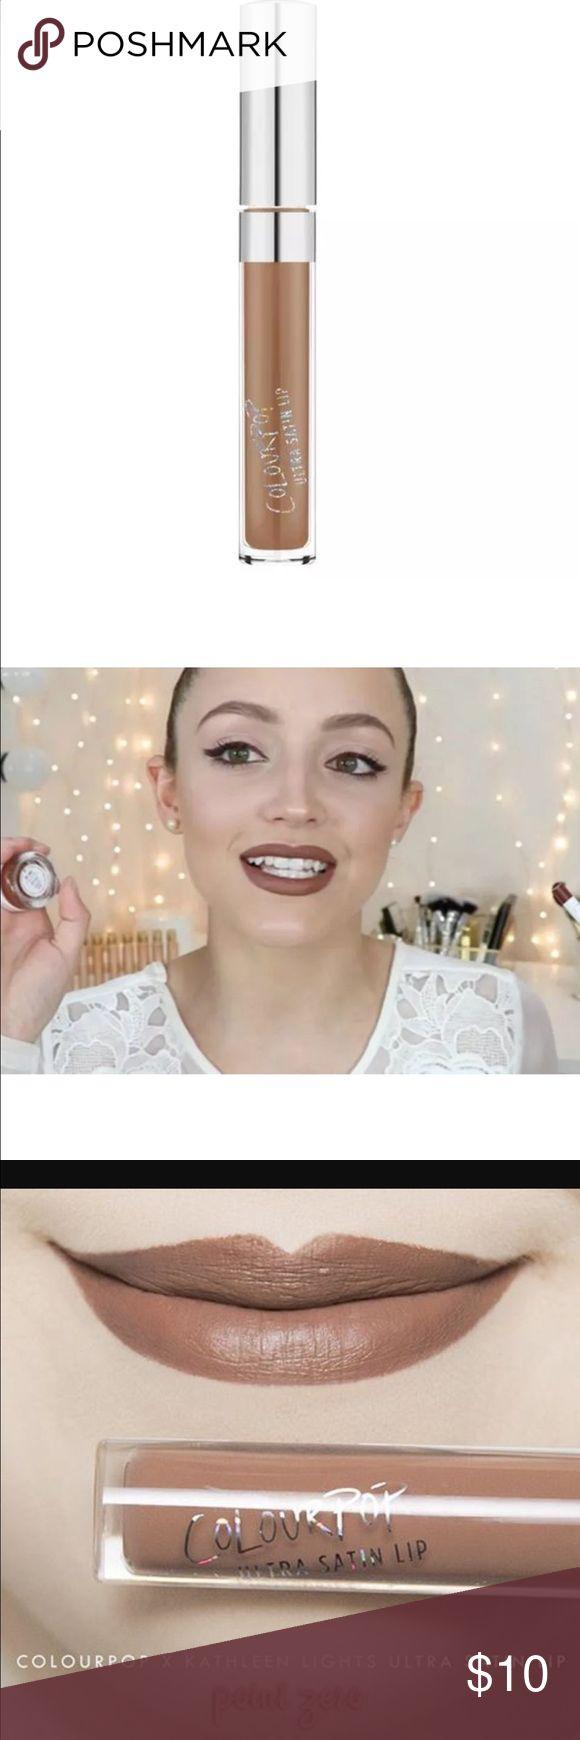 "New ColourPop Kathleen Lights Point Zero Lipstick New in box ColourPop X Kathleen Lights collab Ultra satin lip in ""point zero"". Cool toned grey brown liquid lipstick. Colourpop Makeup Lipstick"